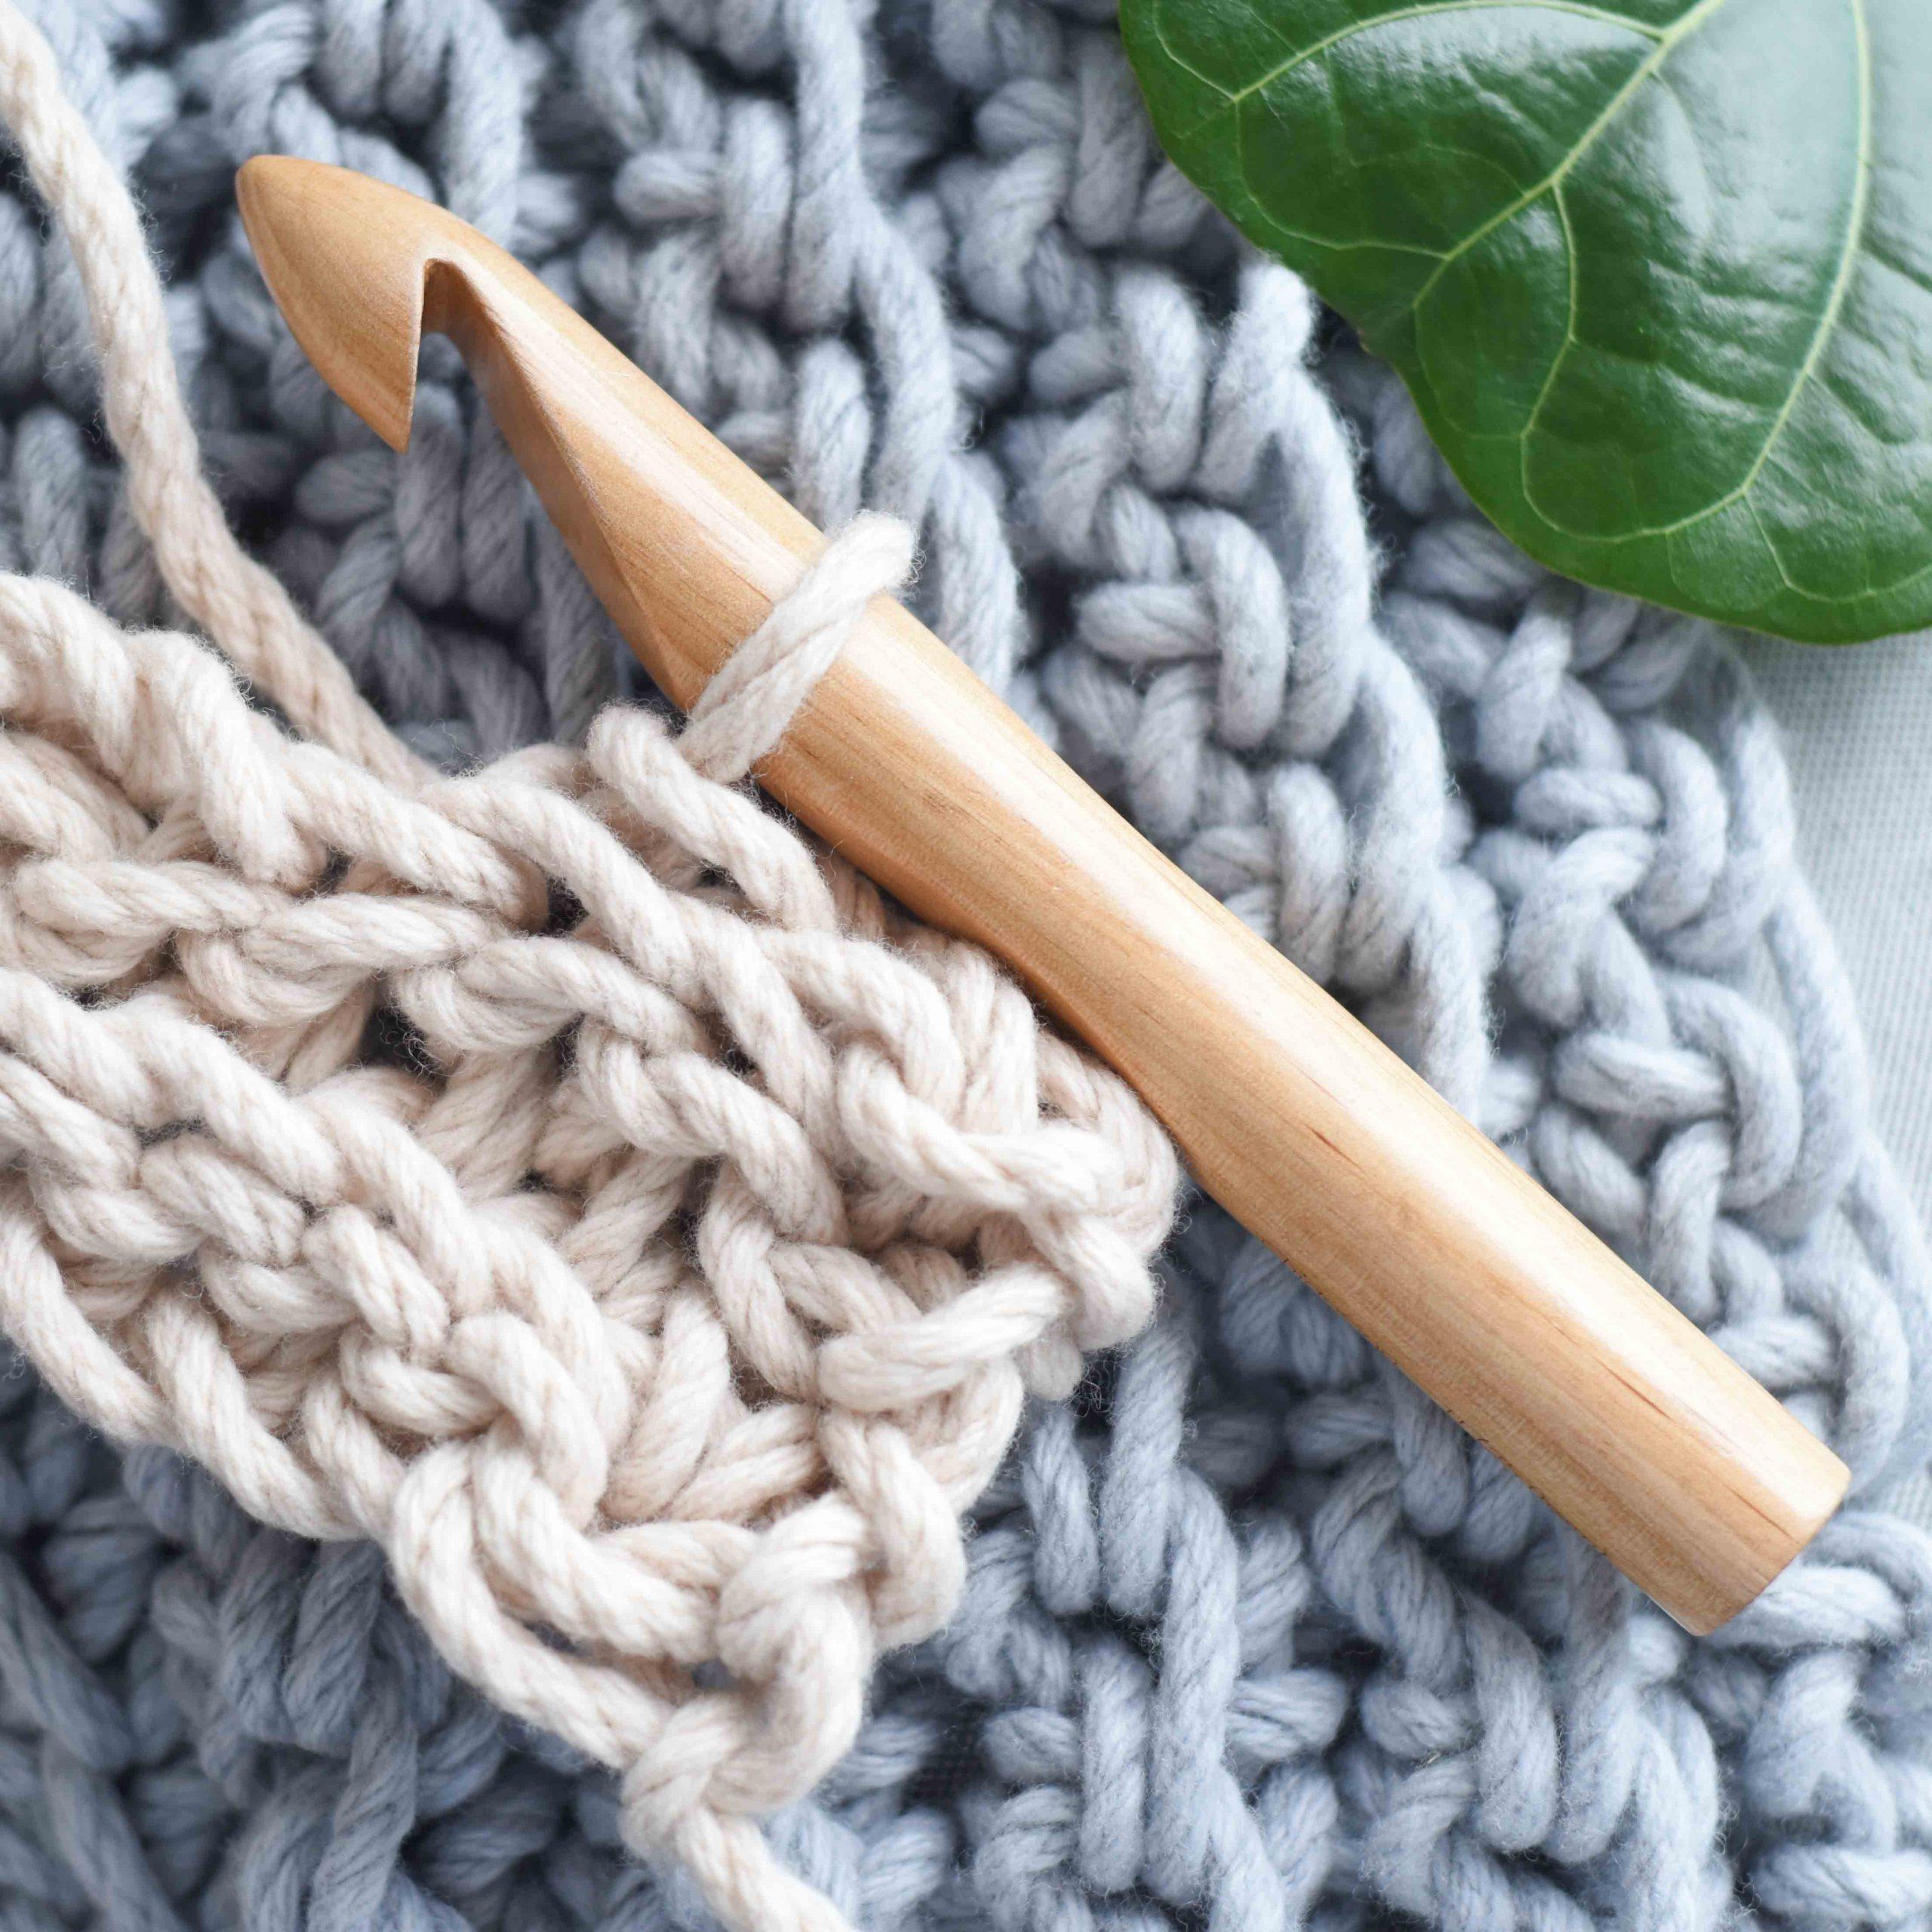 Crocheting the Toasty Heart Teapot Cosy with Homelea Bliss Merino Wool Yarn | Homelea Lass Contemporary Crochet